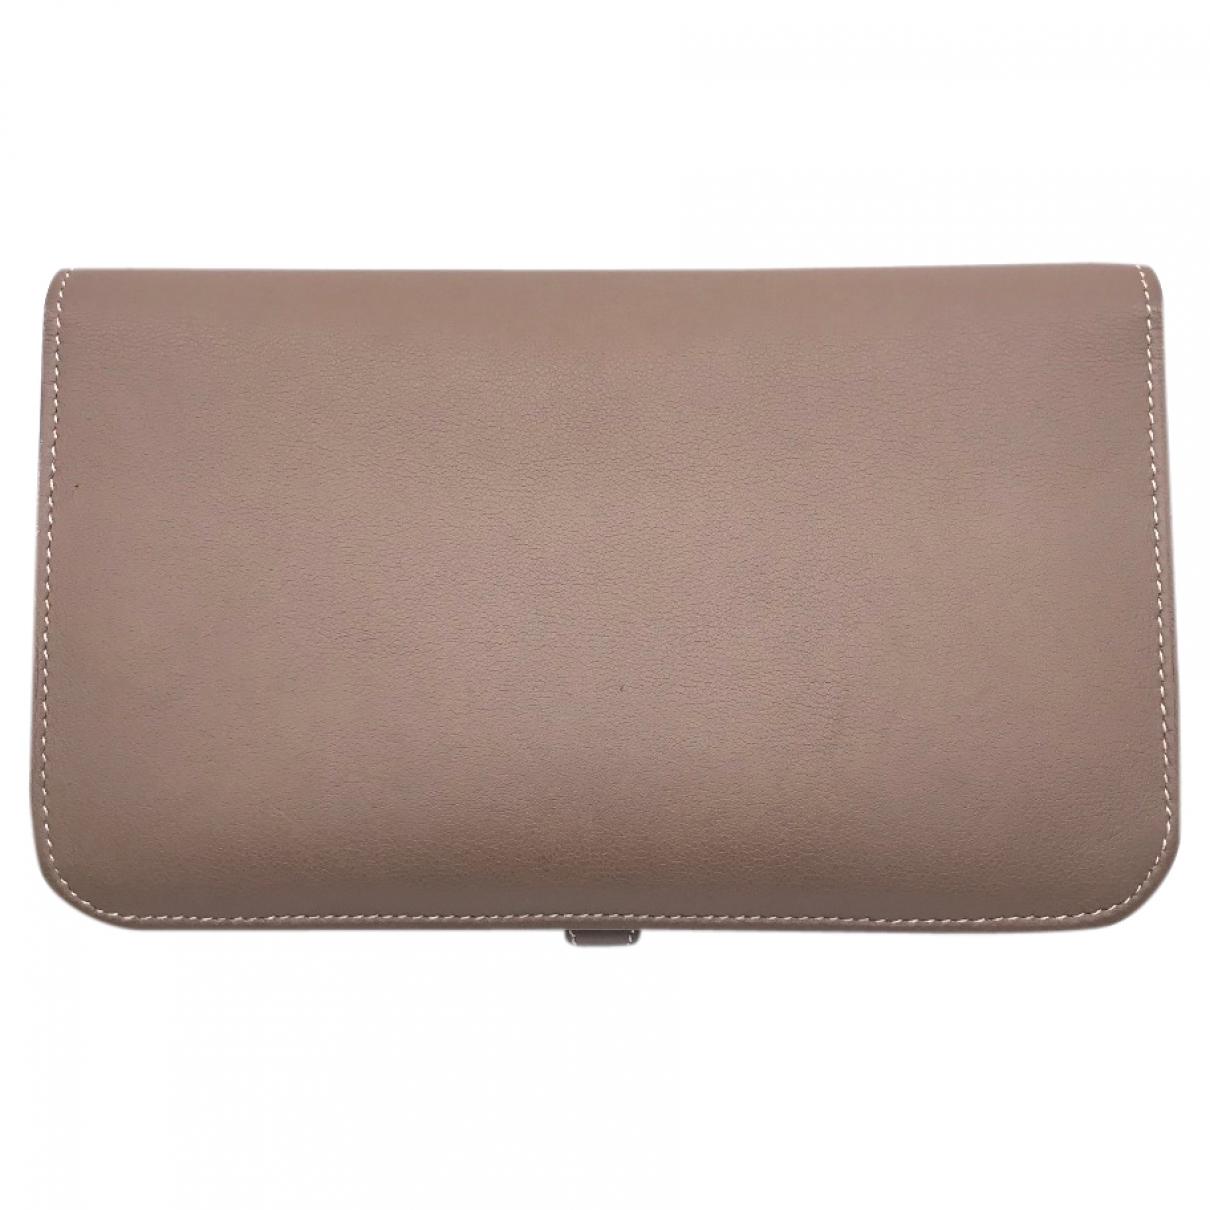 Hermès Dogon Brown Leather wallet for Women \N